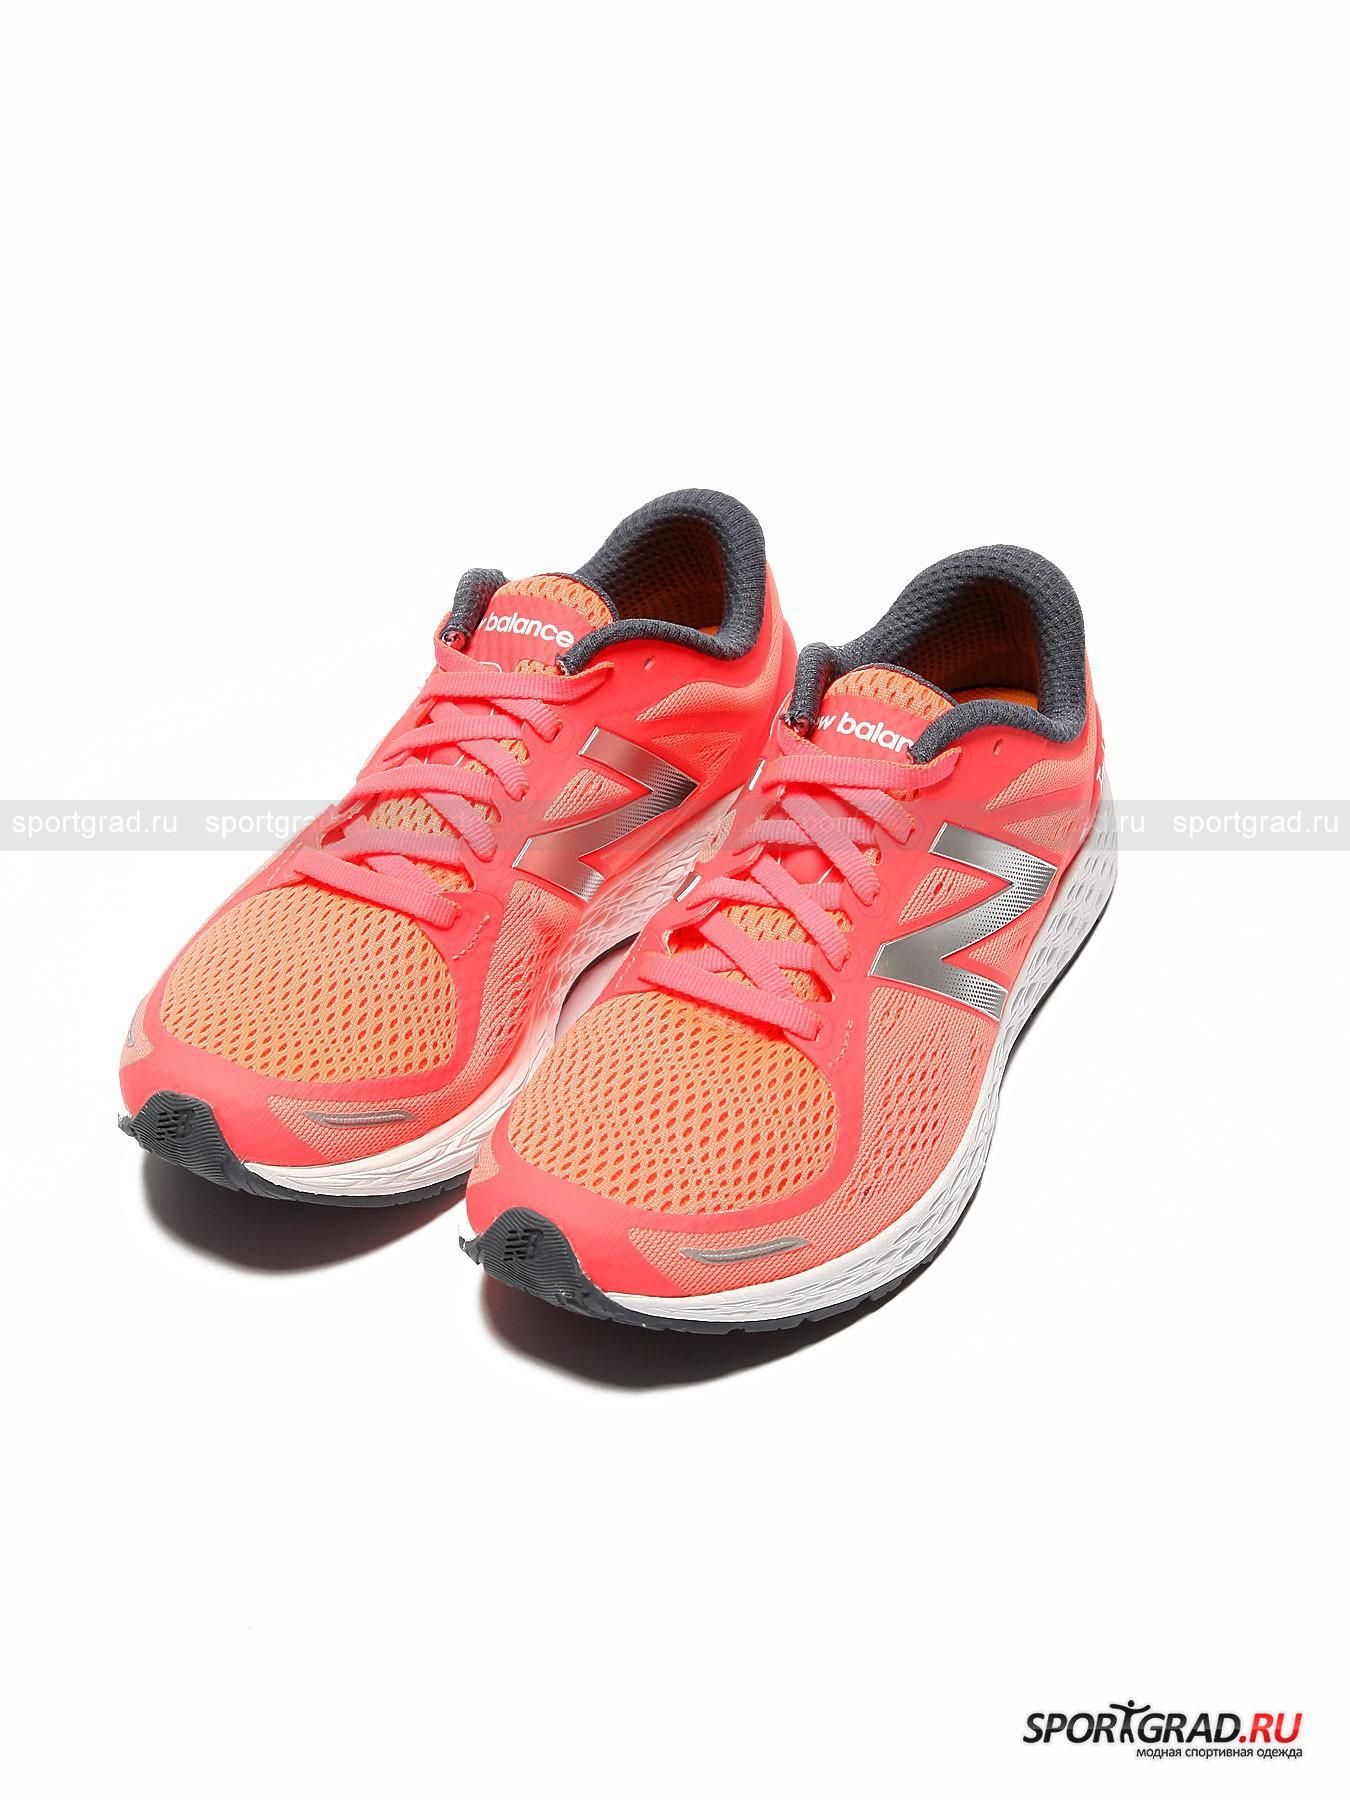 Кроссовки женские для бега Fresh Foam Zante v2 NEW BALANCE